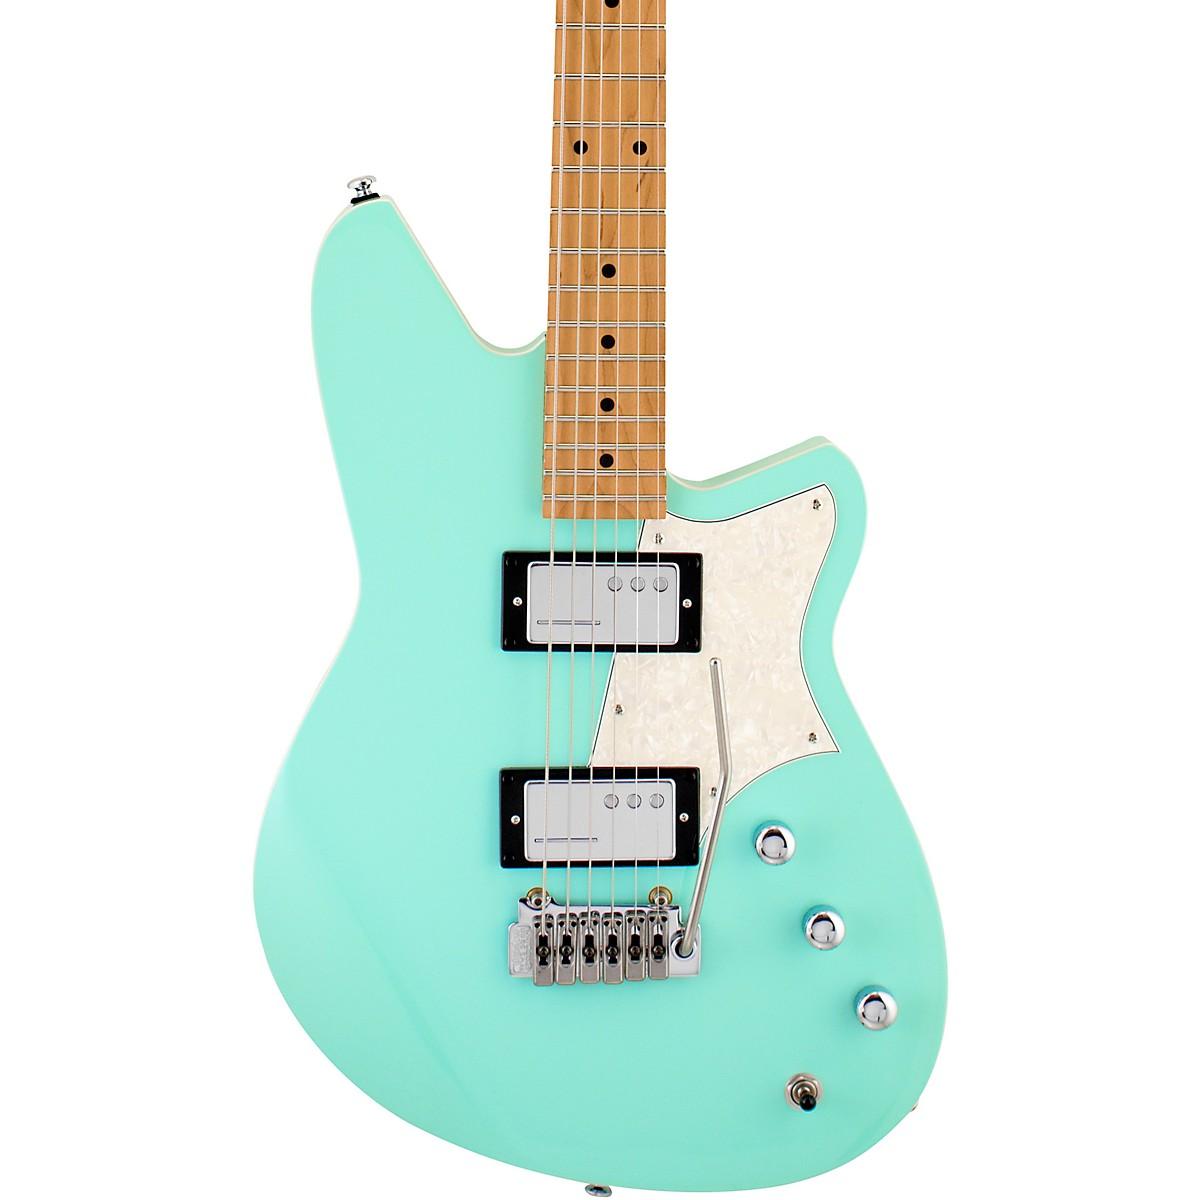 Reverend Descent HC90 Maple Fingerboard Baritone Electric Guitar